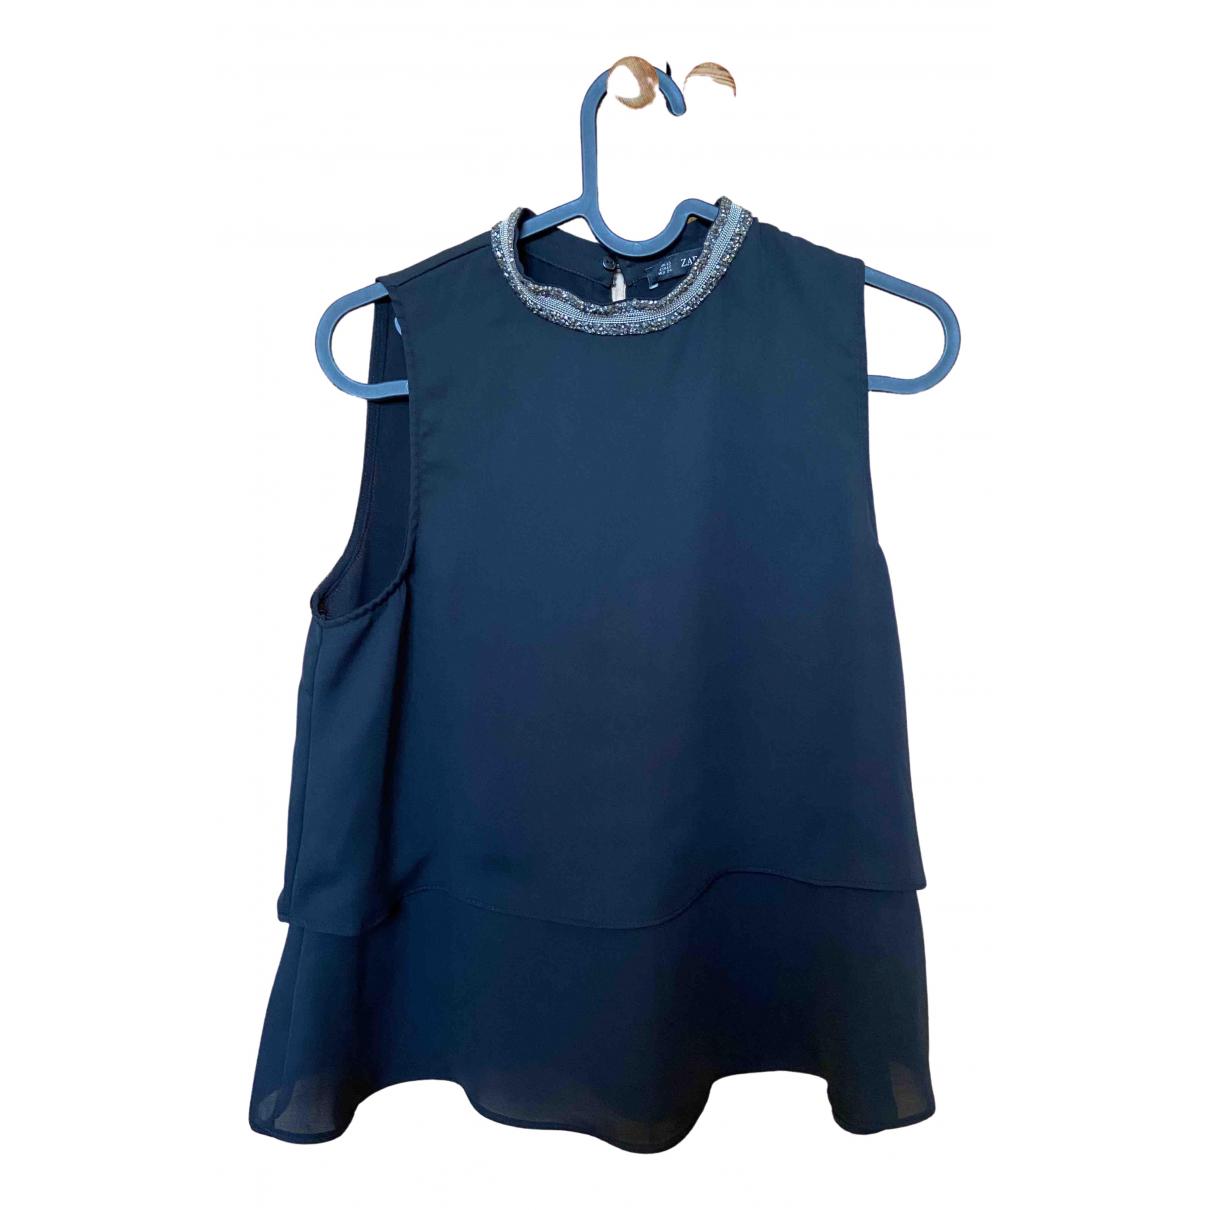 Zara \N Top in  Schwarz Polyester